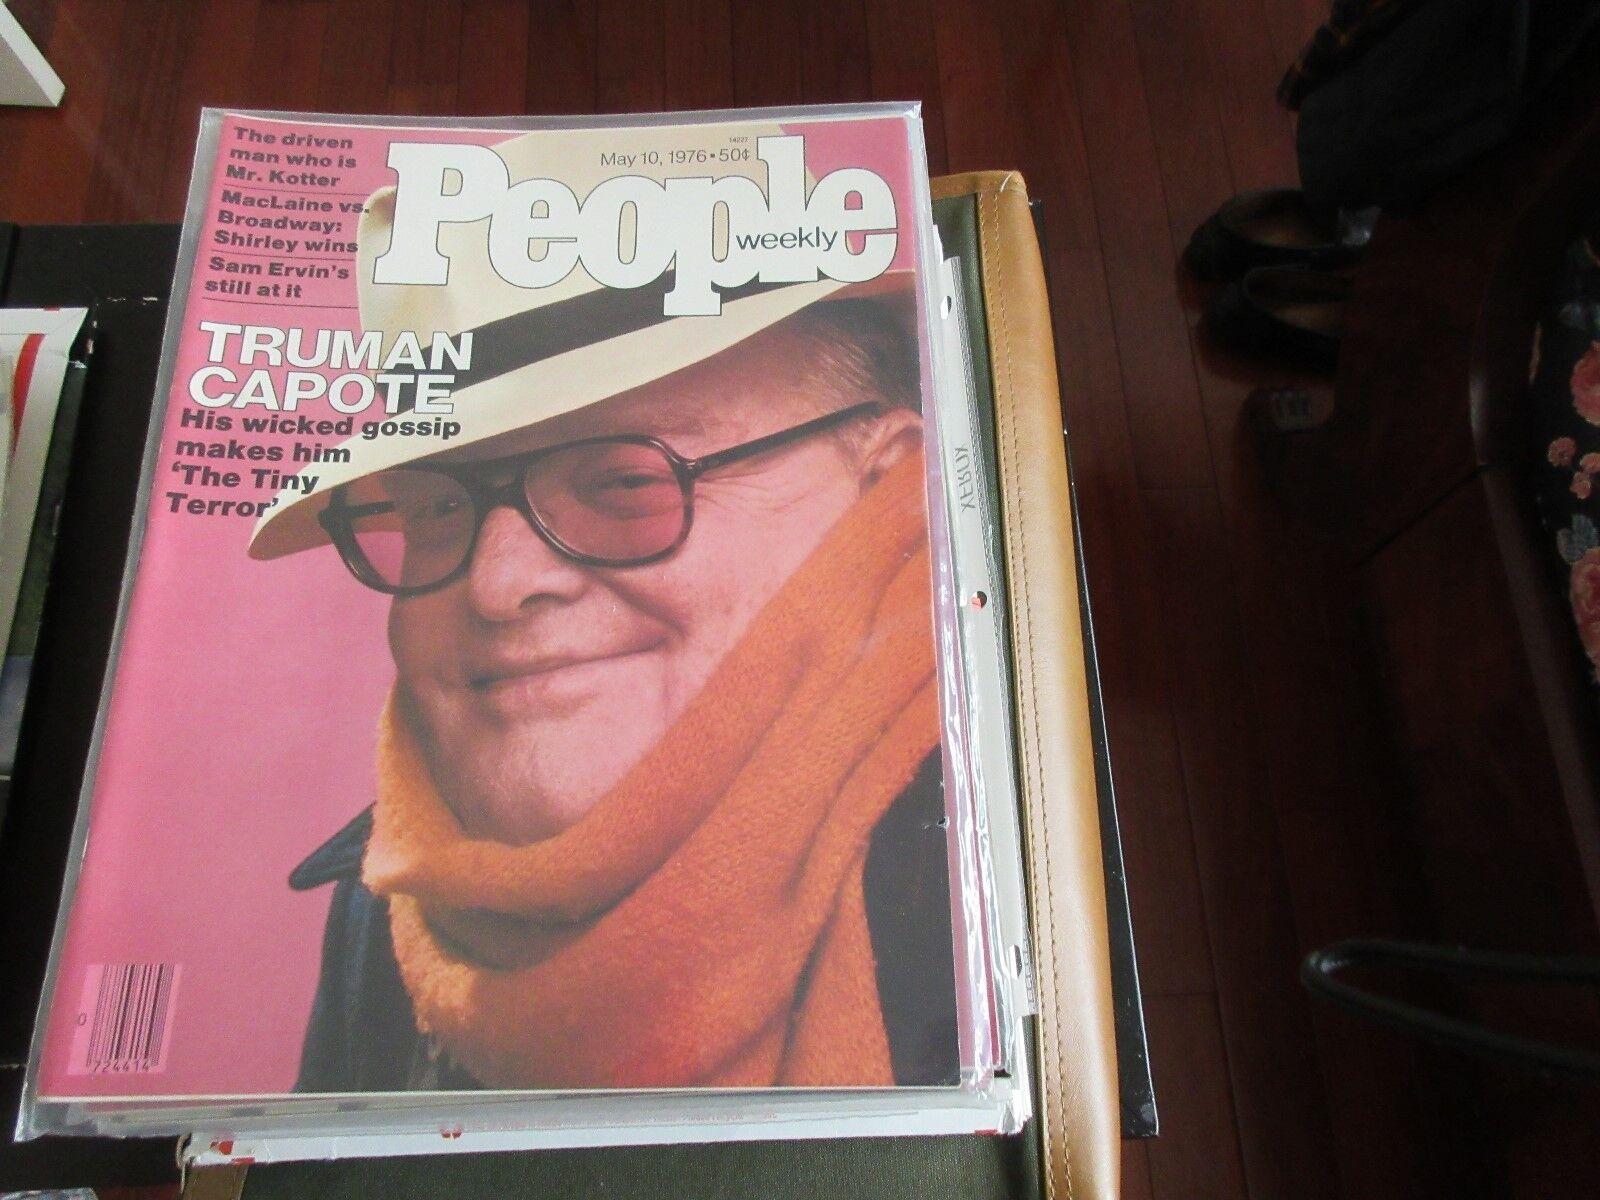 Truman Capote , PEOPLE MAGAZINE , 5/10/76 , Mr. Kotter